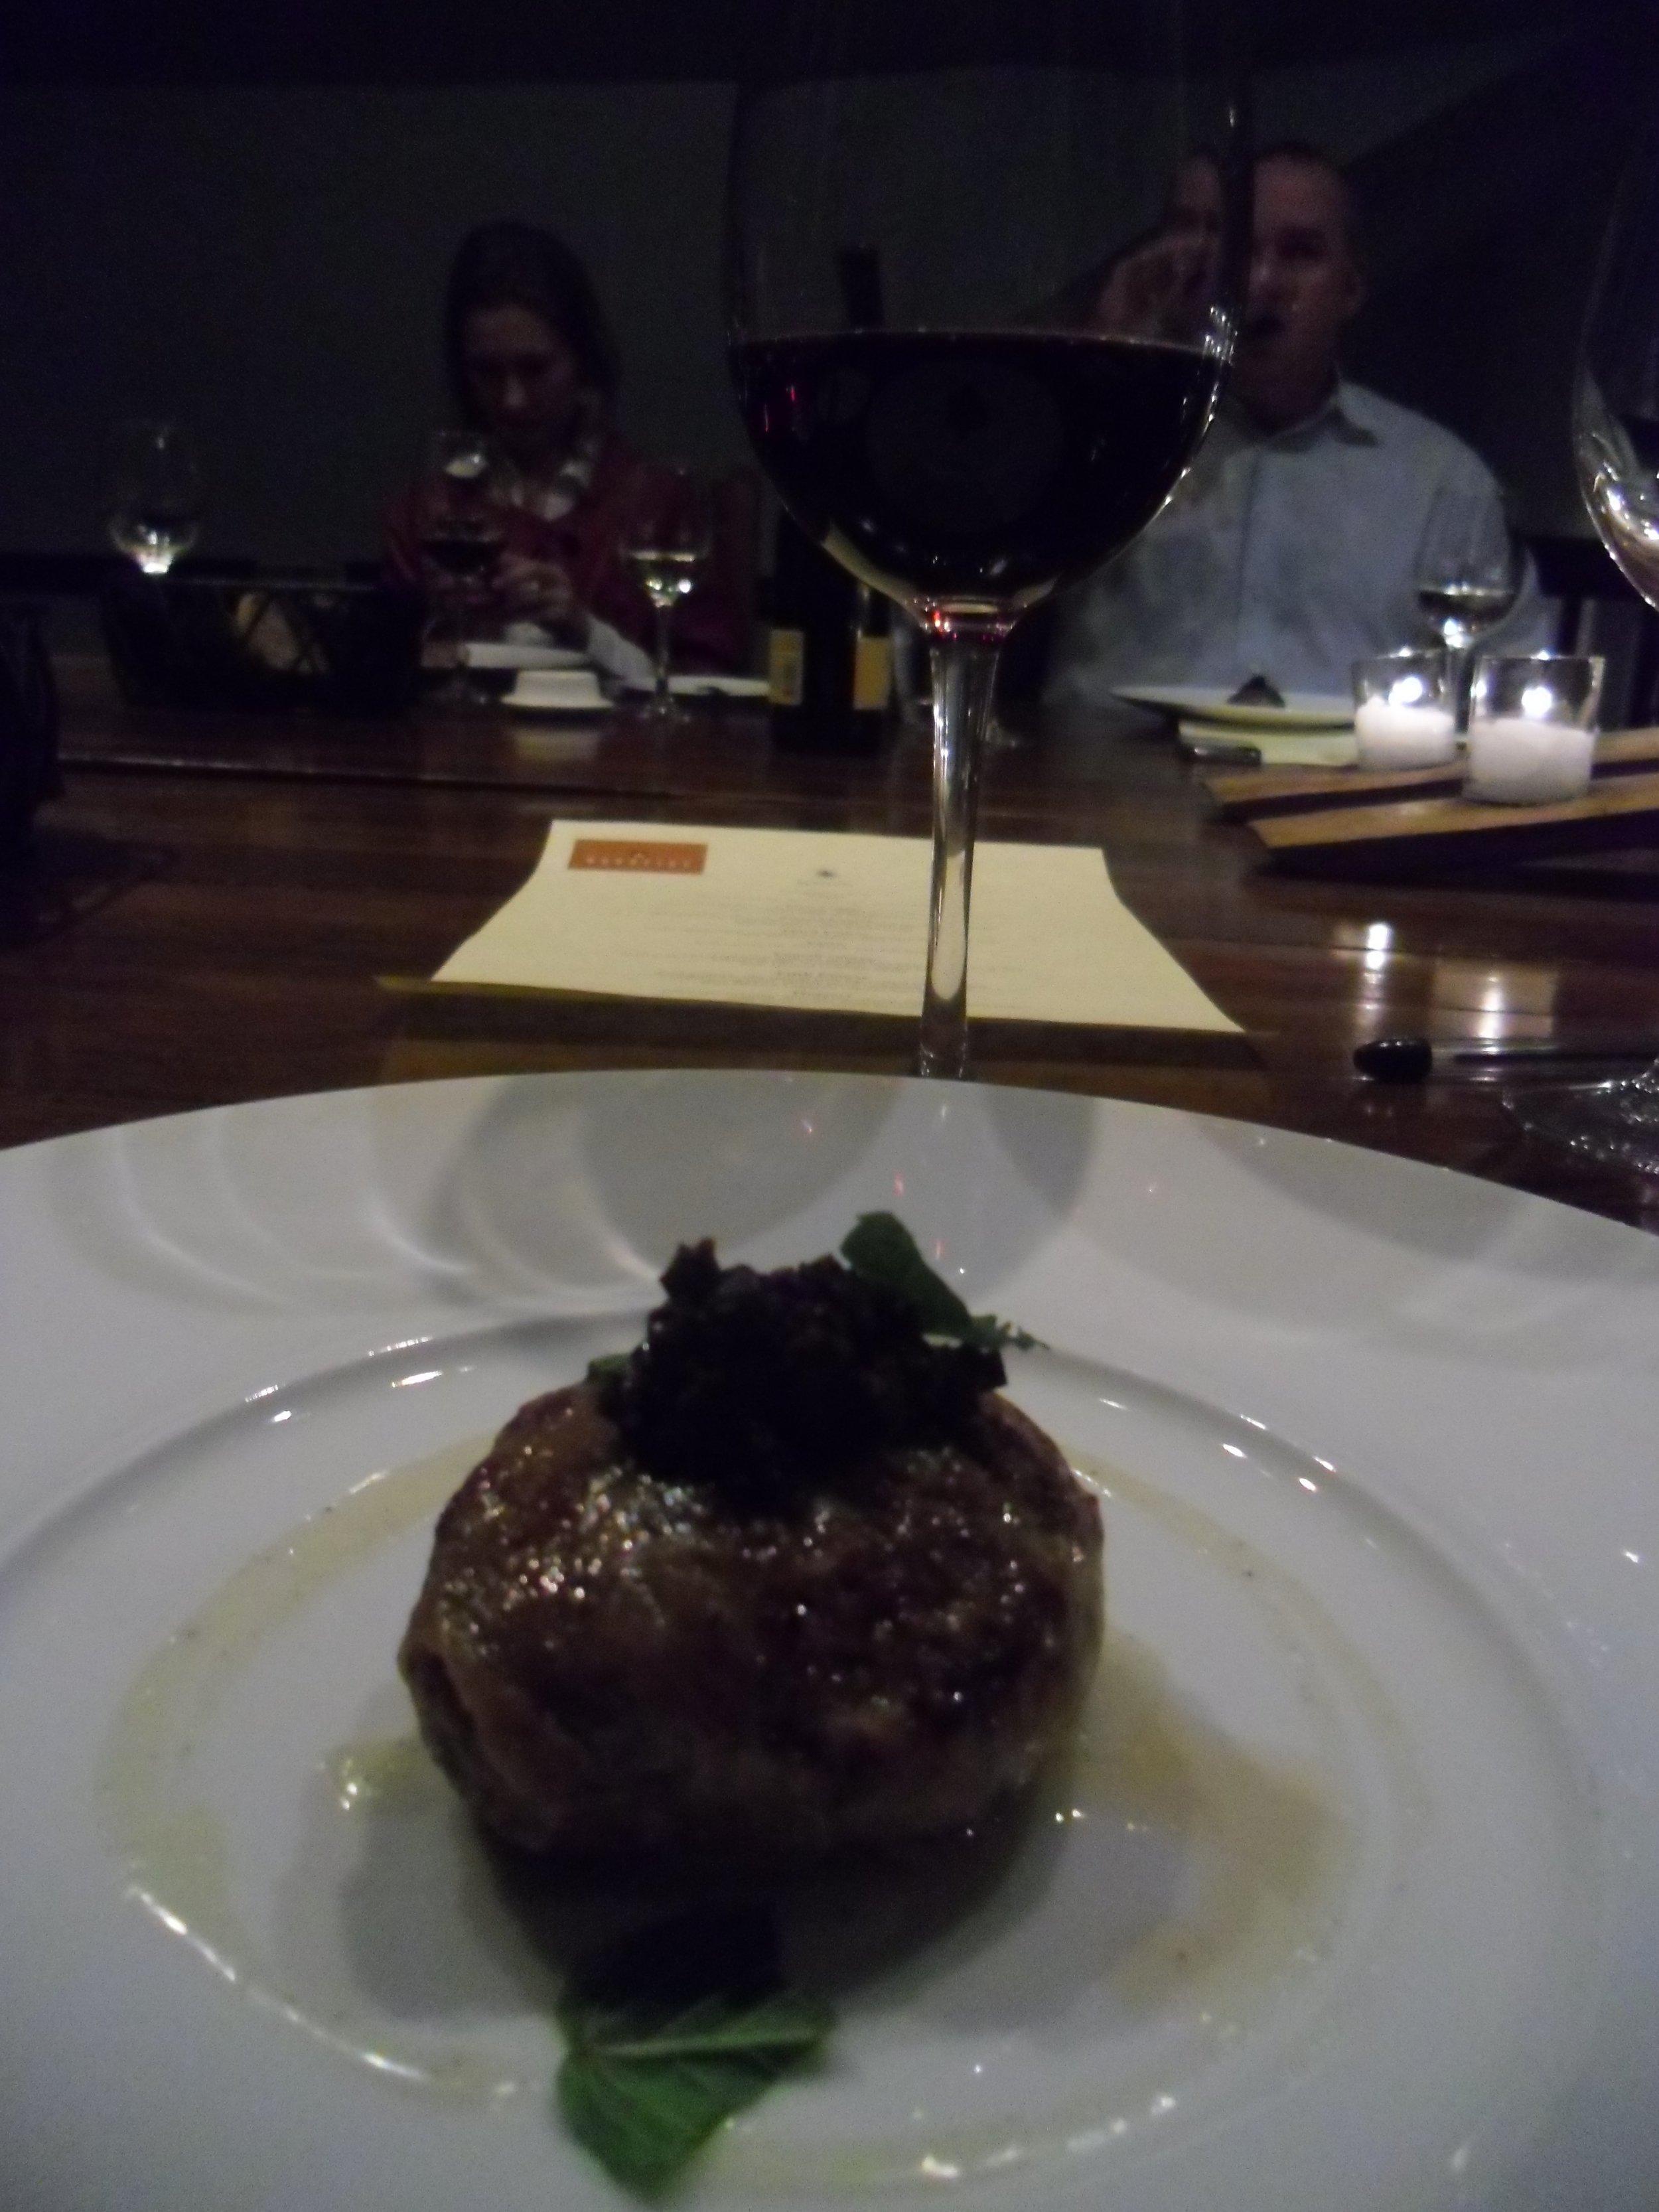 mirassou-wine-dinner-atlanta-wine-tasting4.jpg